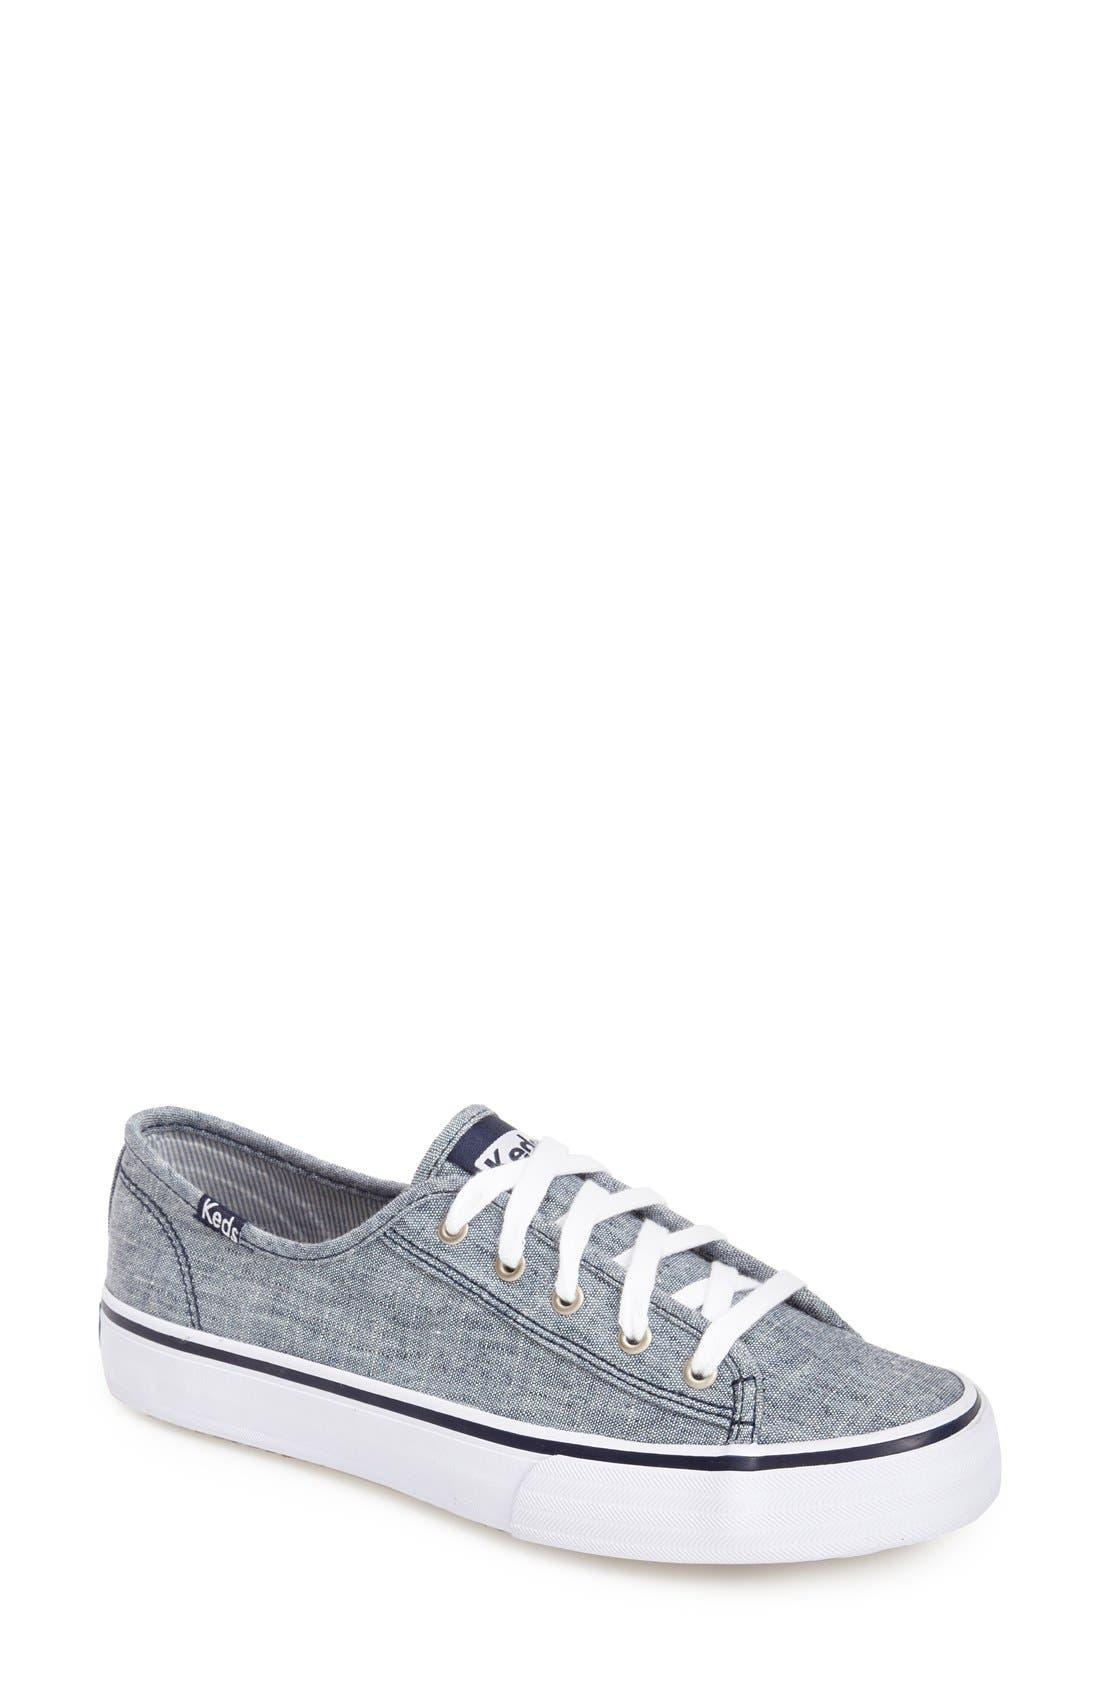 Alternate Image 1 Selected - Keds® 'Double Up - Linen' Sneaker (Women)